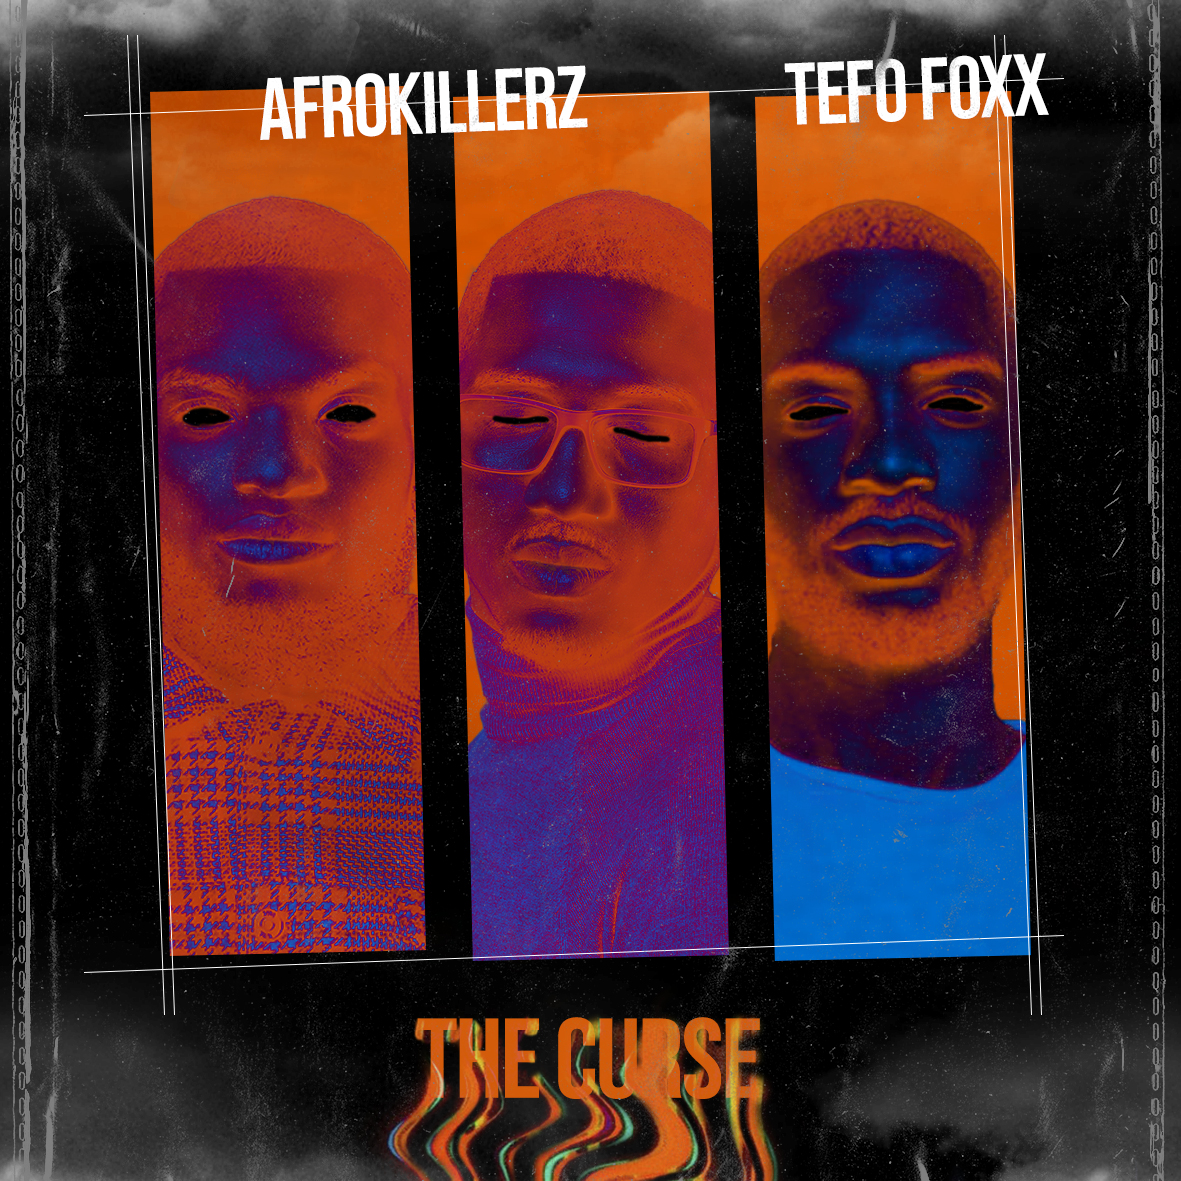 AFROKILLERZ X TEFO FOXX- THE CURSE